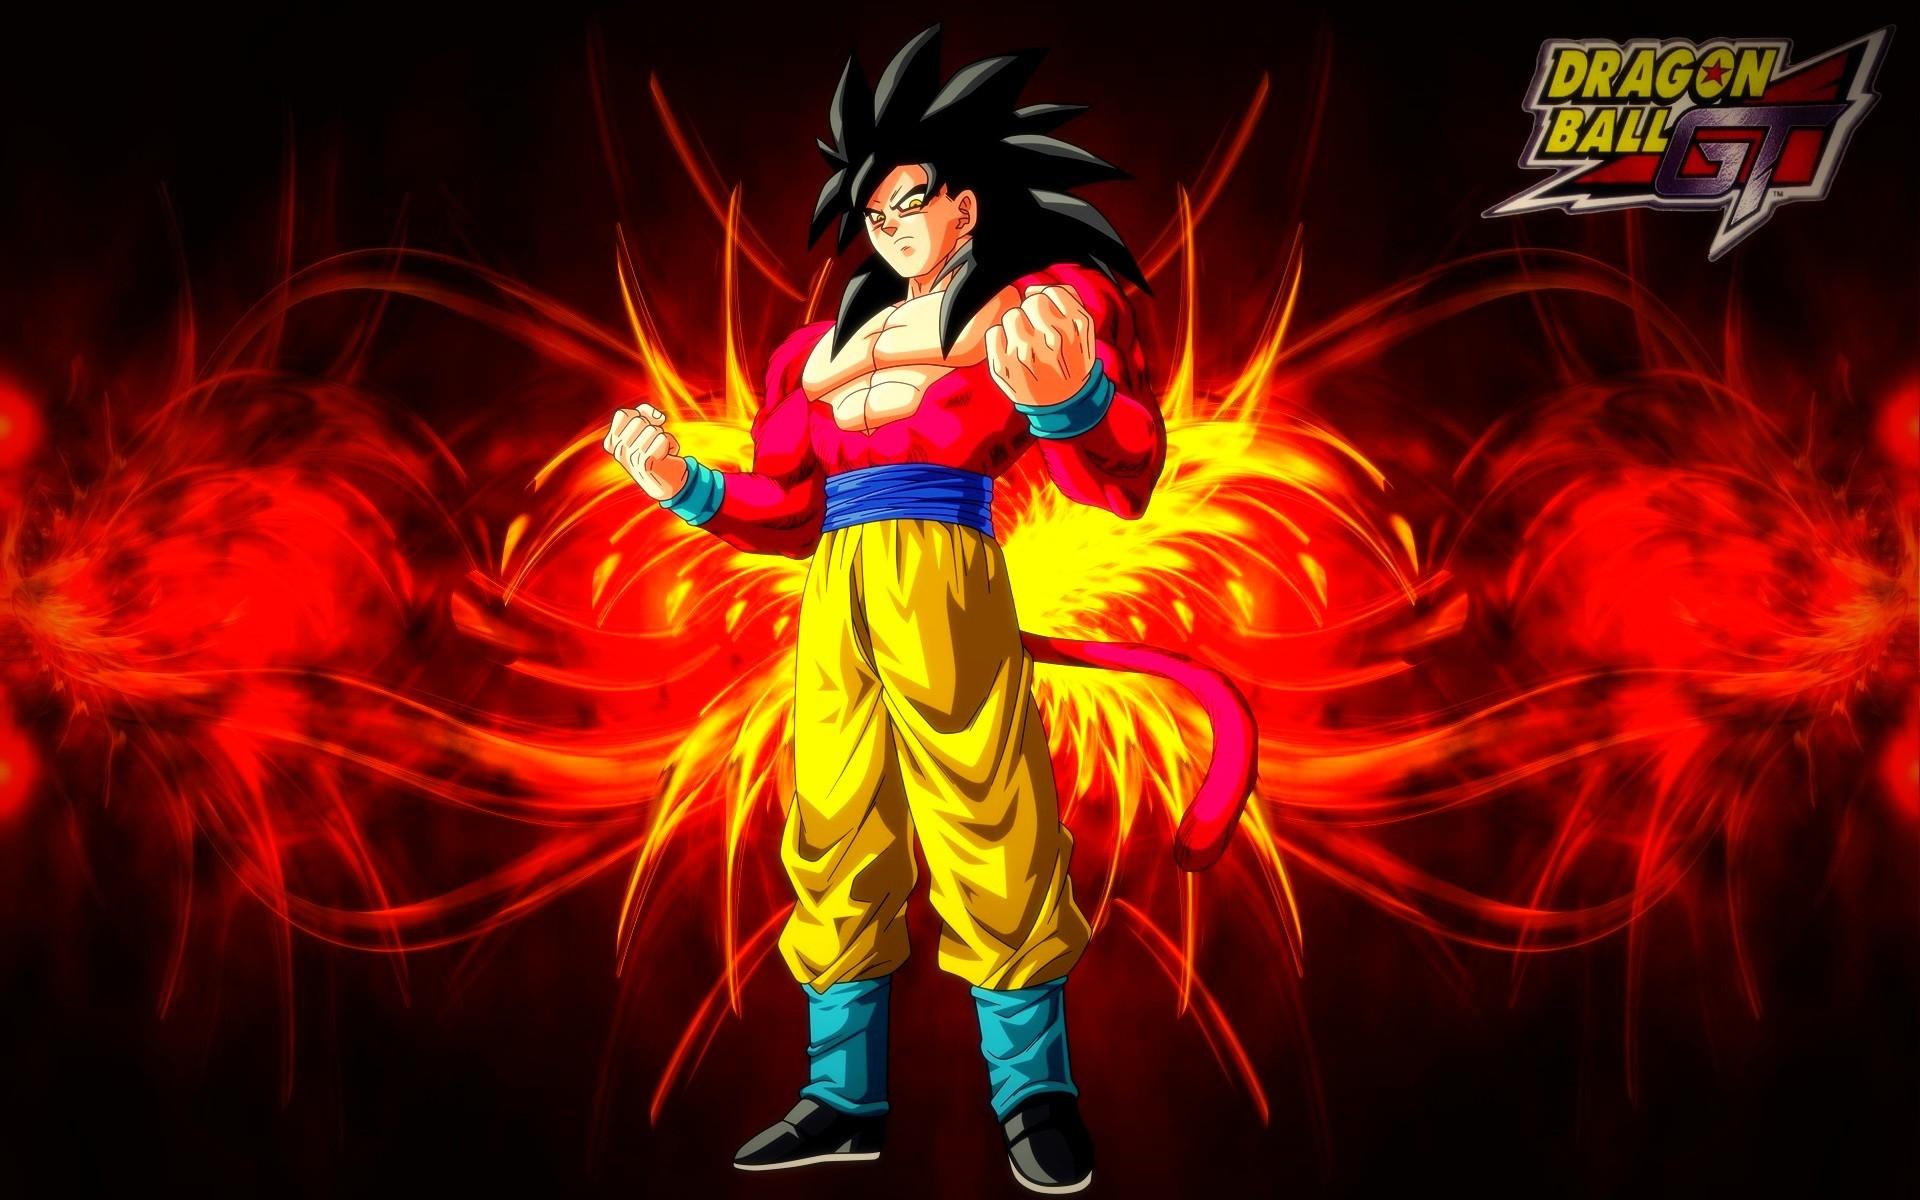 Dragonball GT – Goku Super Saiyan 4 Wallpaper by BlackShadowX306 on .